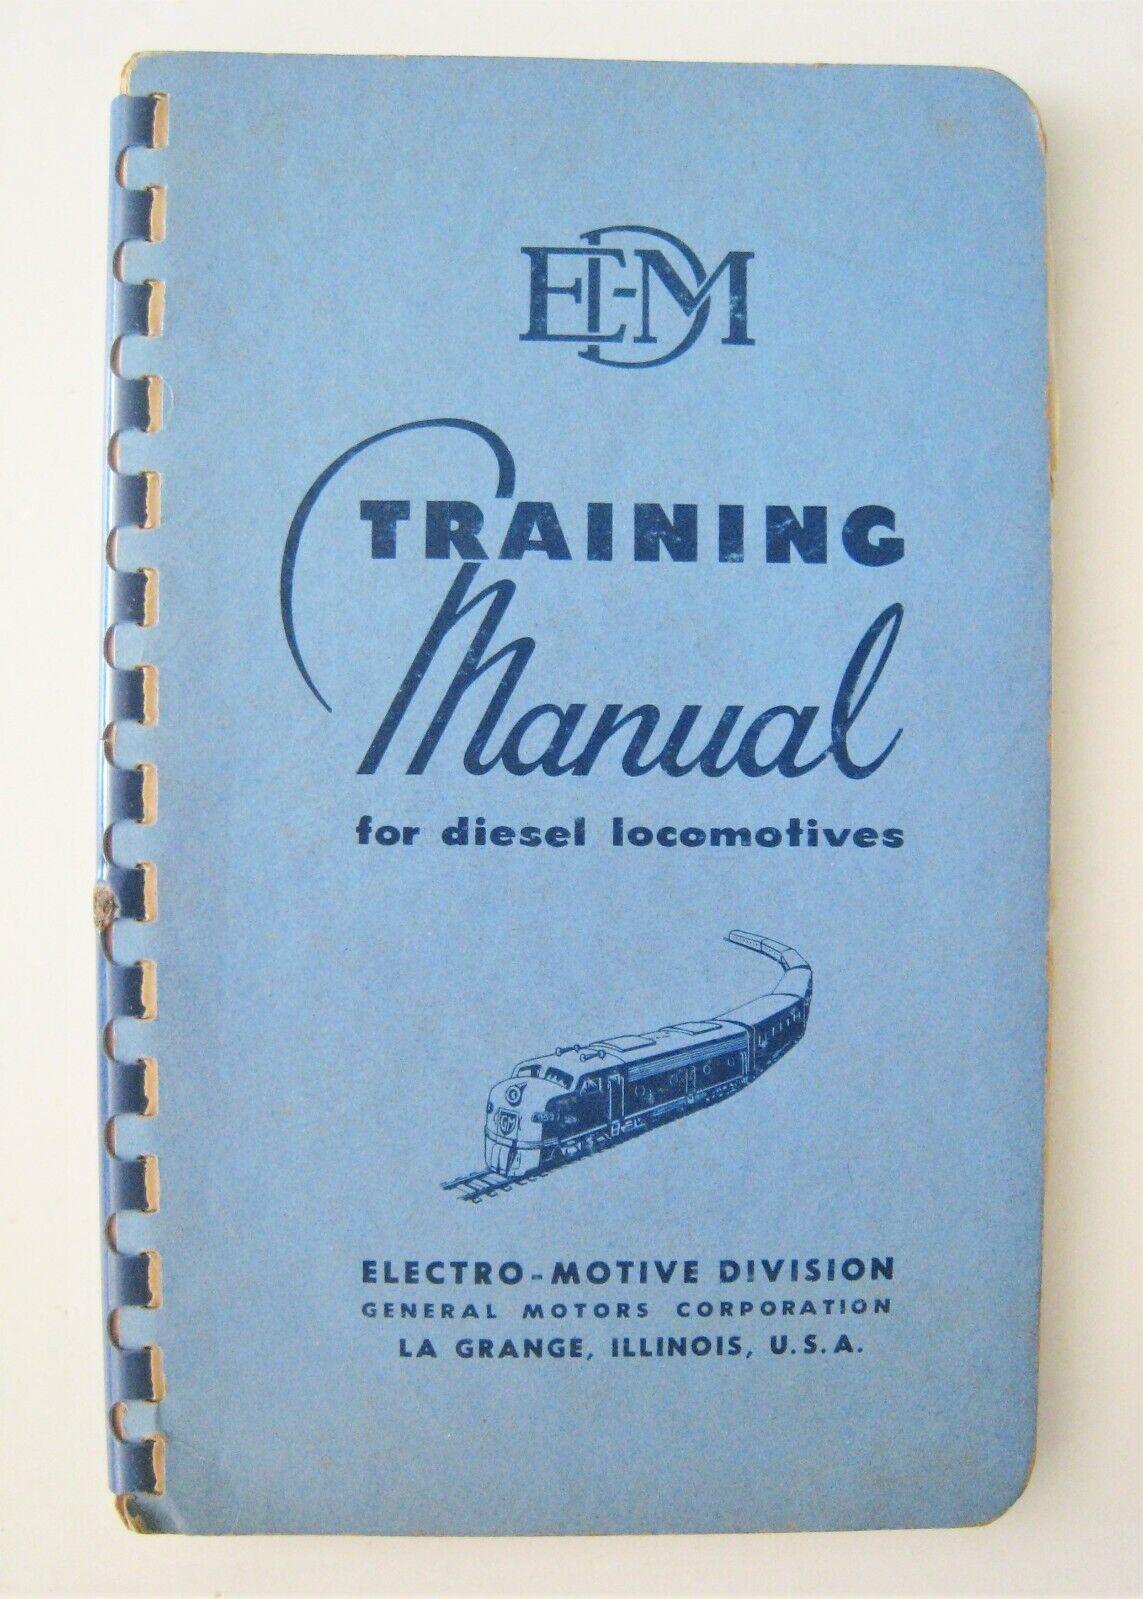 Vintage 1952 Electro-Motive General Motors GM EMD Training Manual Diesel Engines